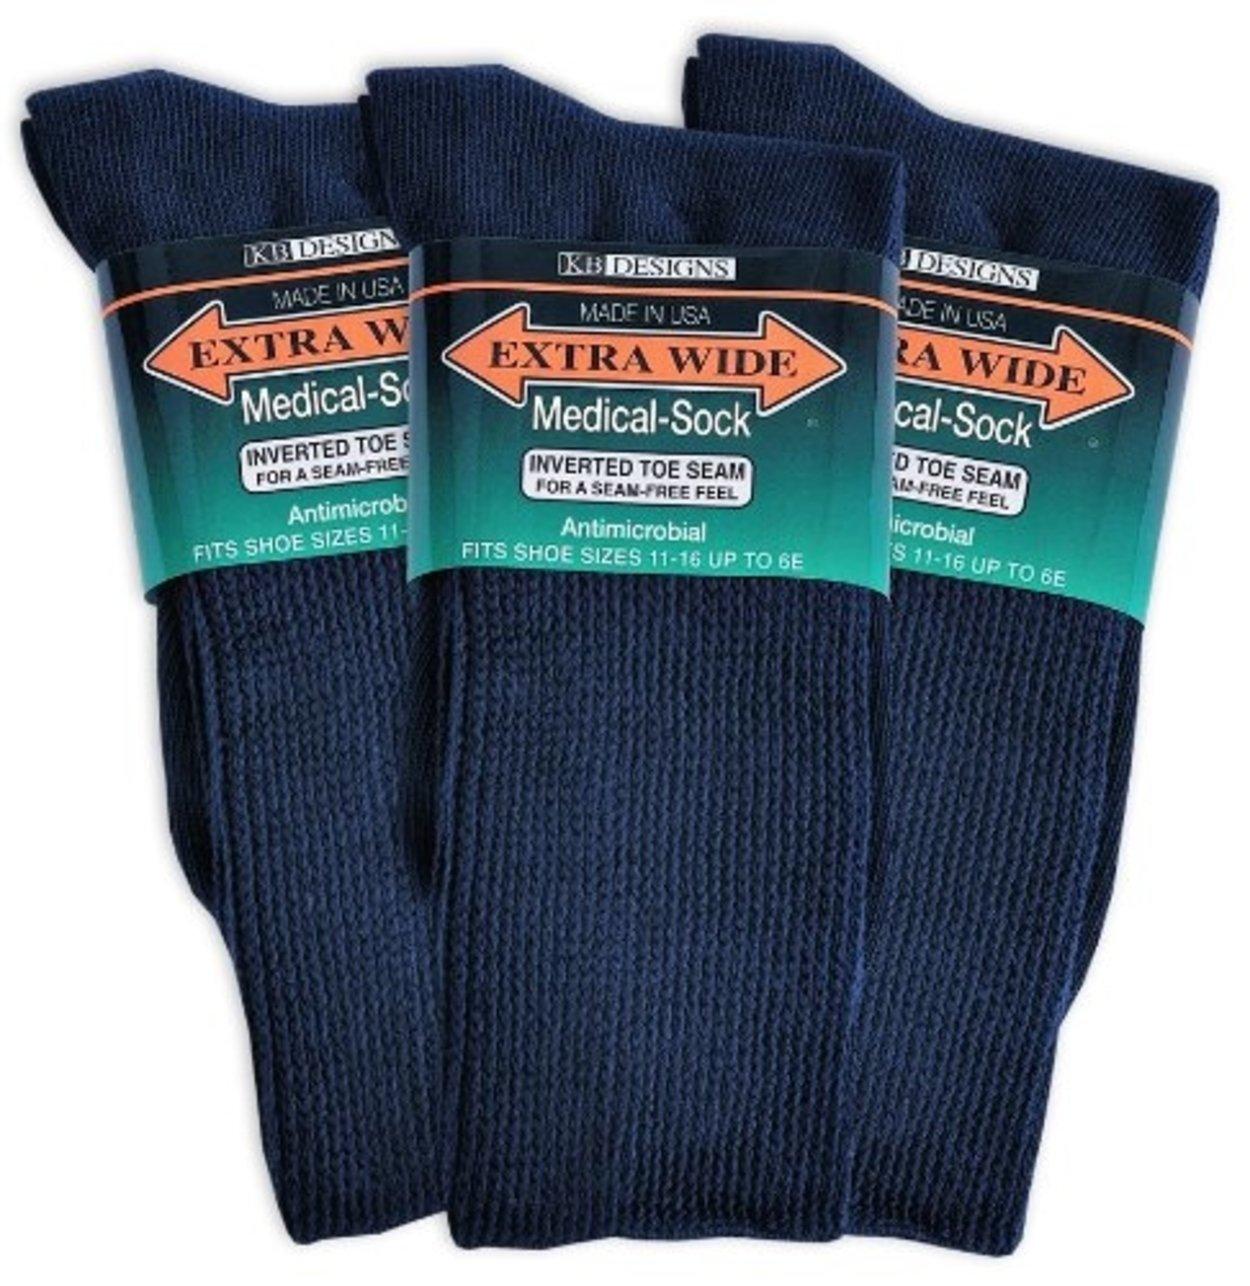 Extra Wide Medic Socks 11/16 6 pair for 48.99 (Navy)